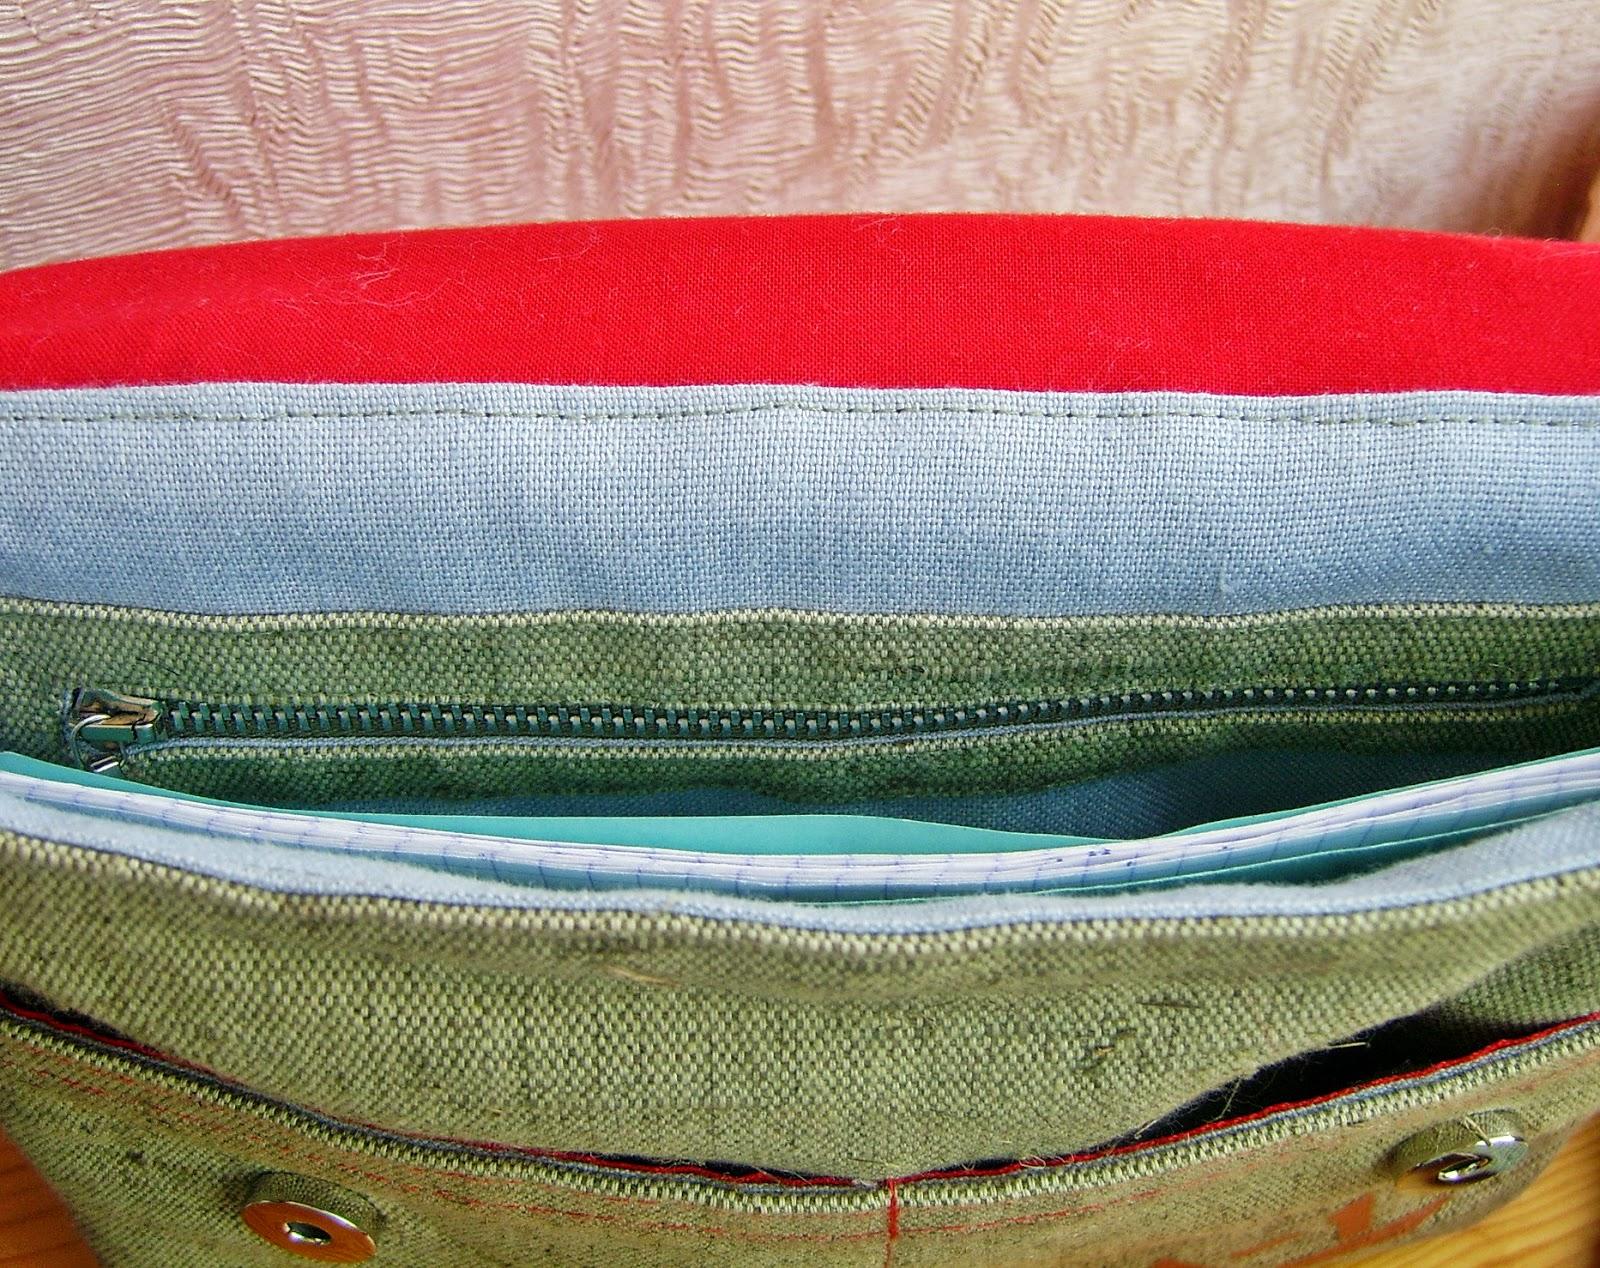 сумка-планшет, внутренний карман